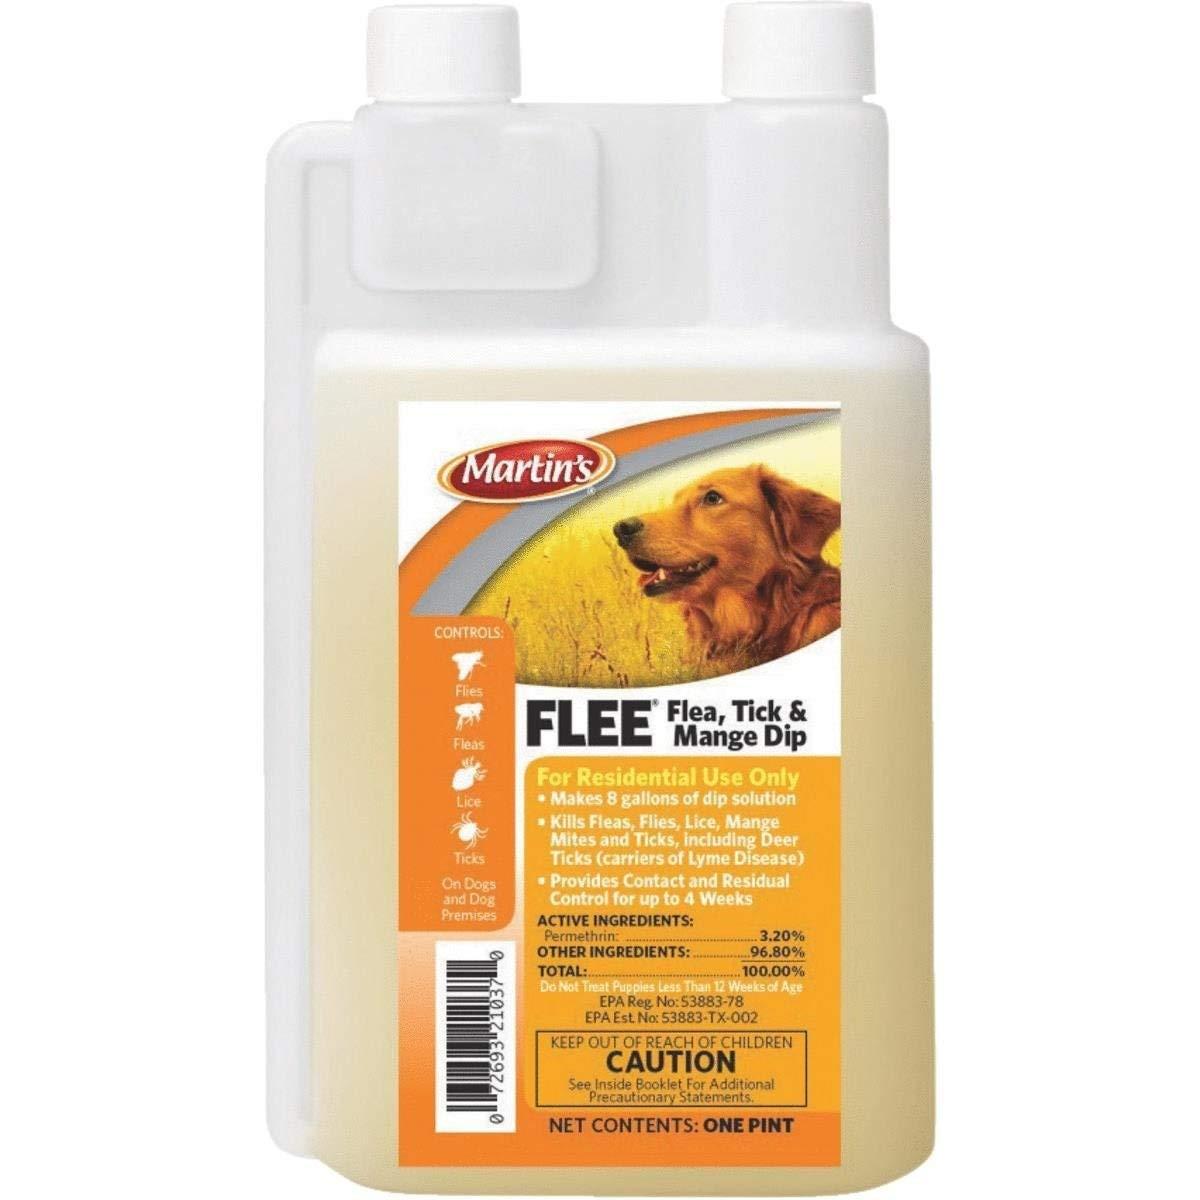 Martin's Mange, Flea & Tick Treatment Dip - 82021037 Pack of 2 by NA